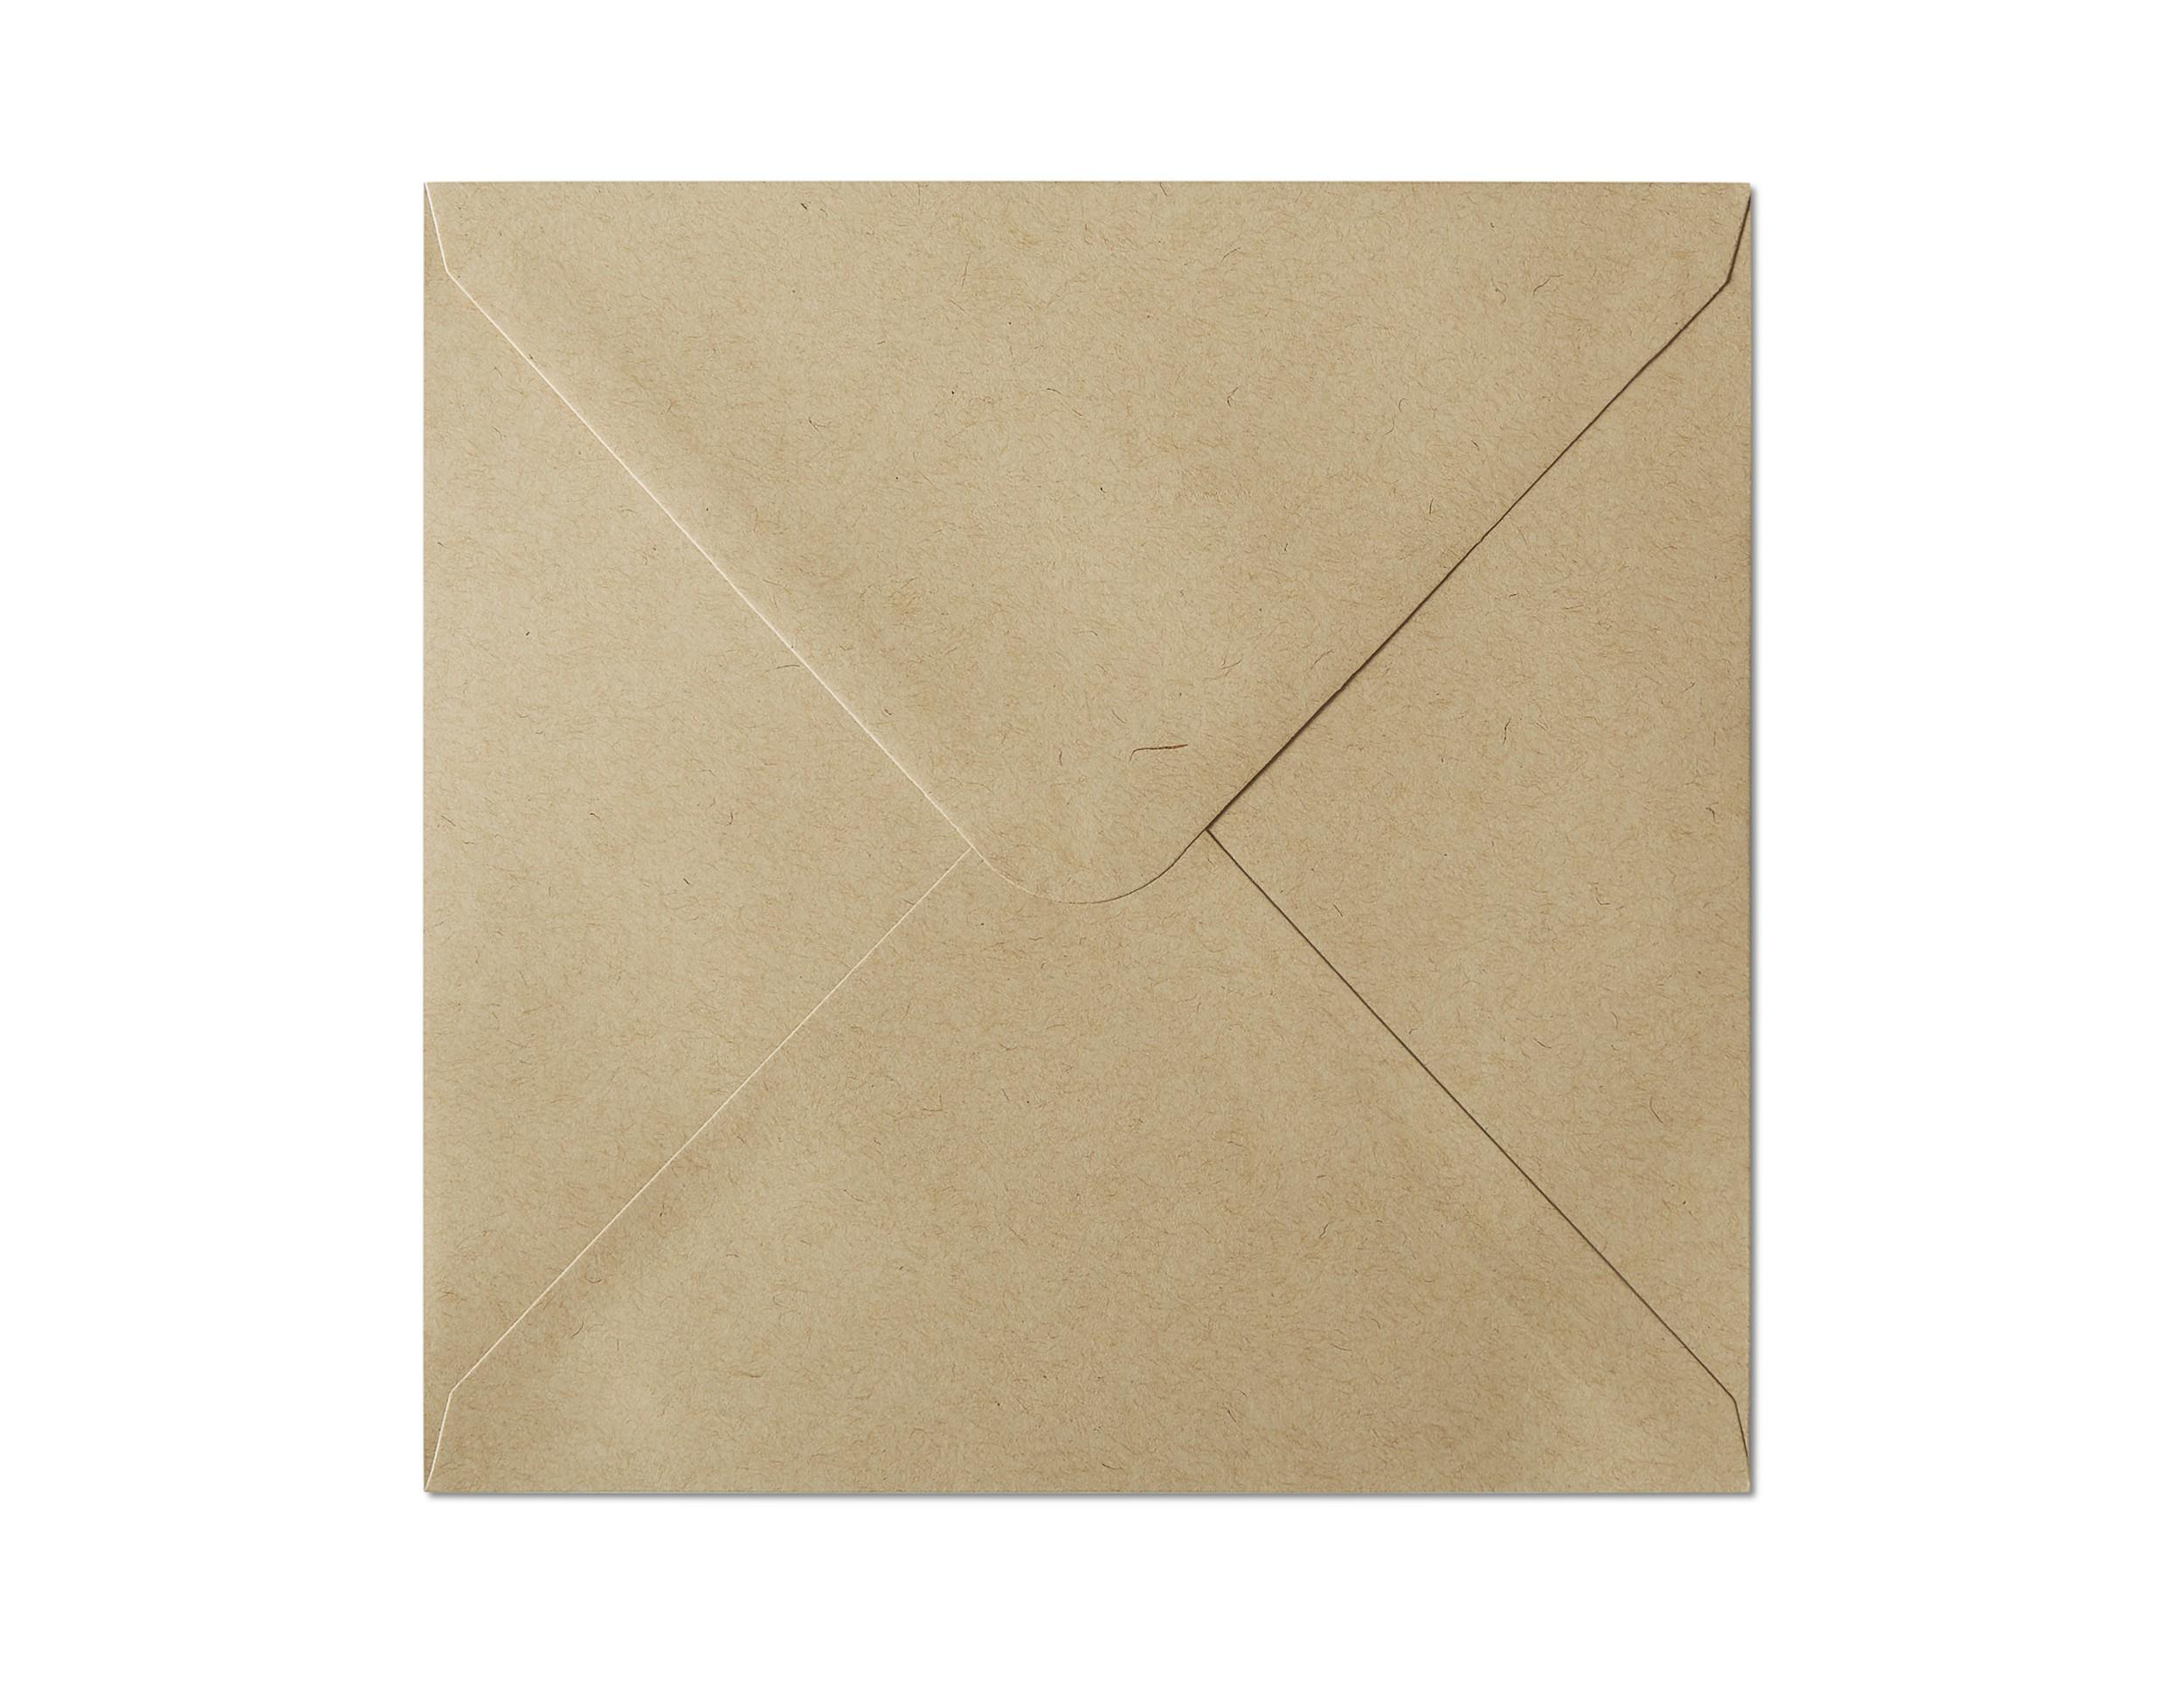 Galeria Papieru obálky 160 Nature tmavě béžová 120g, 10ks